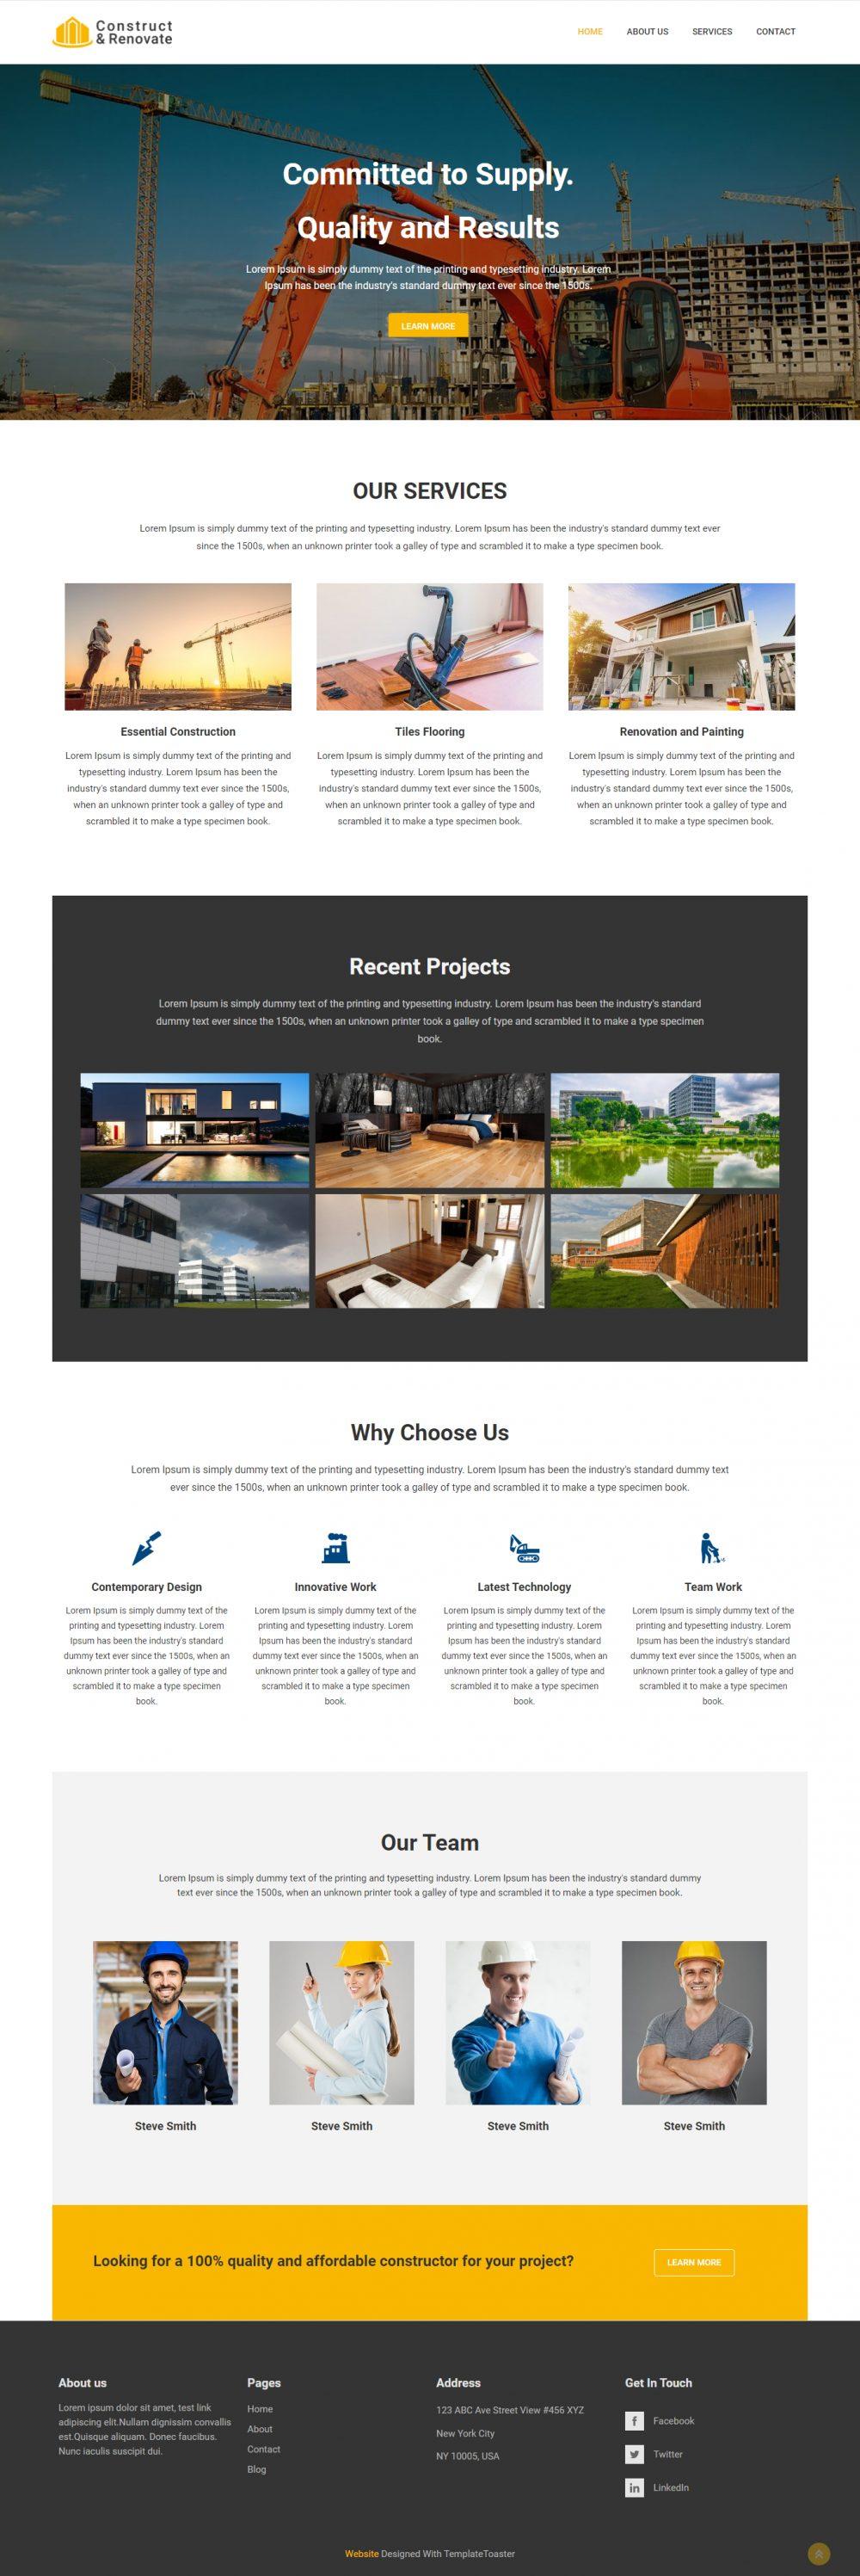 Construct & Renovate -- Construction Company Joomla Template